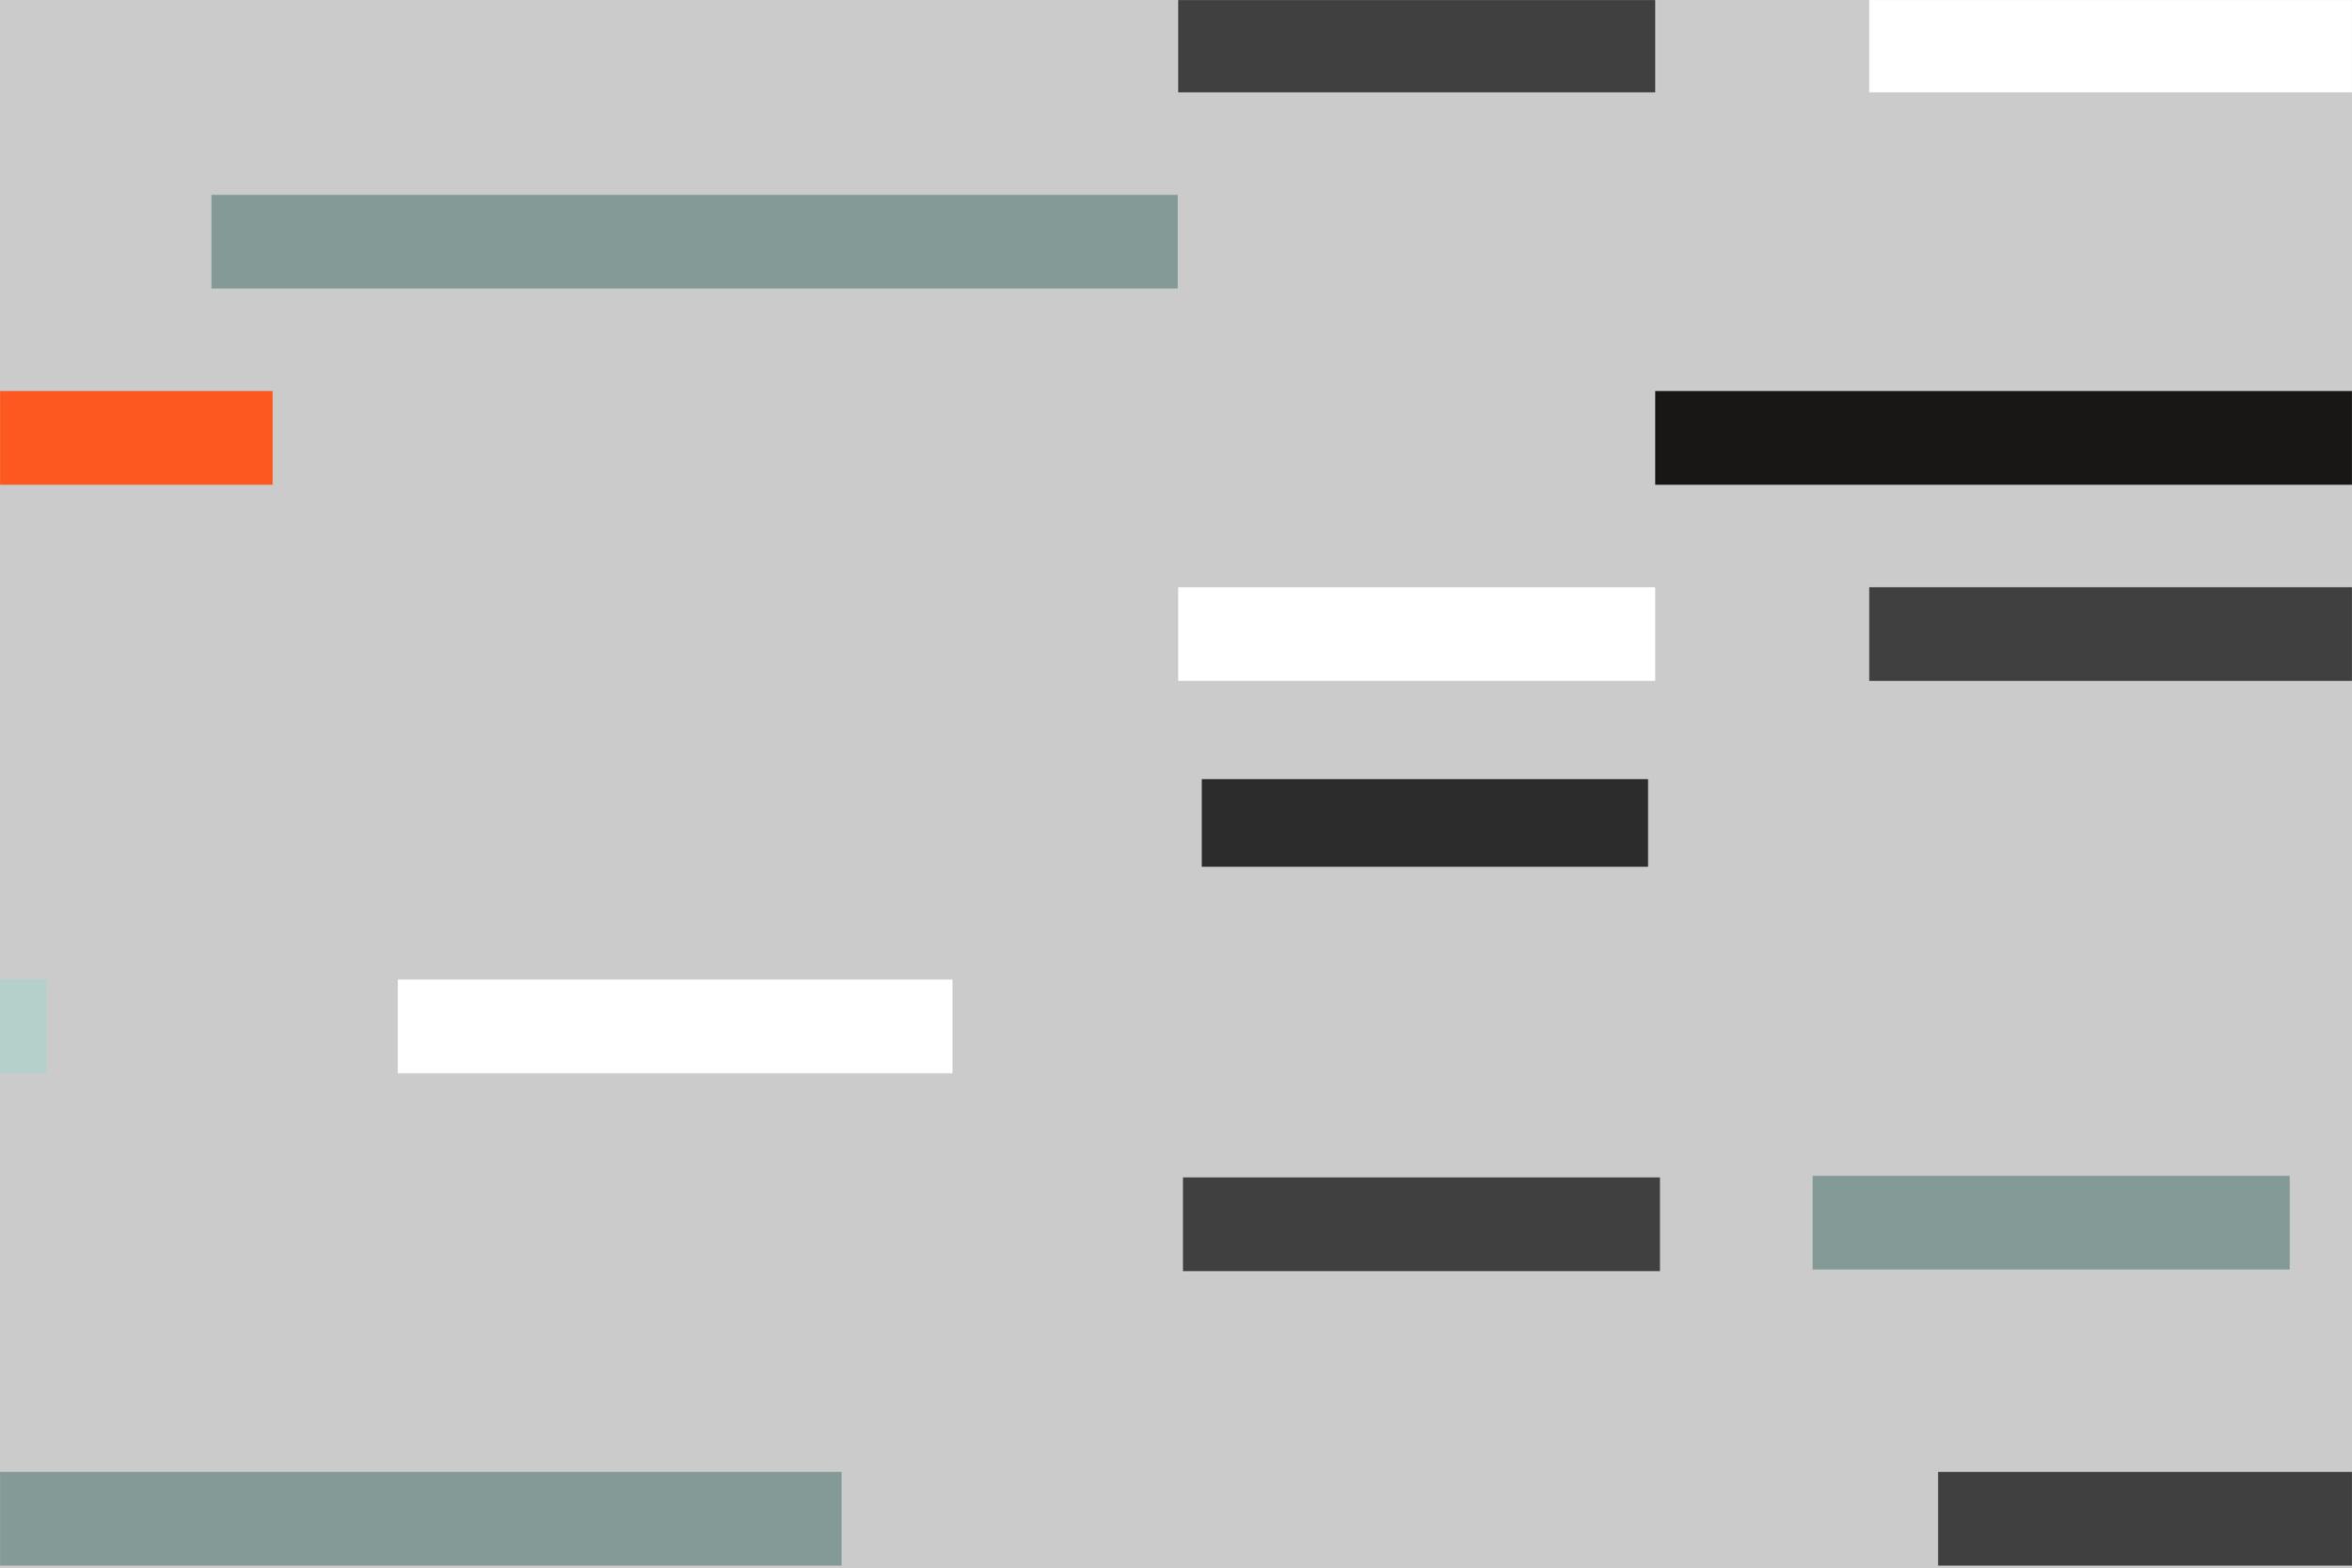 OV_Genetics_Pattern_150x.png